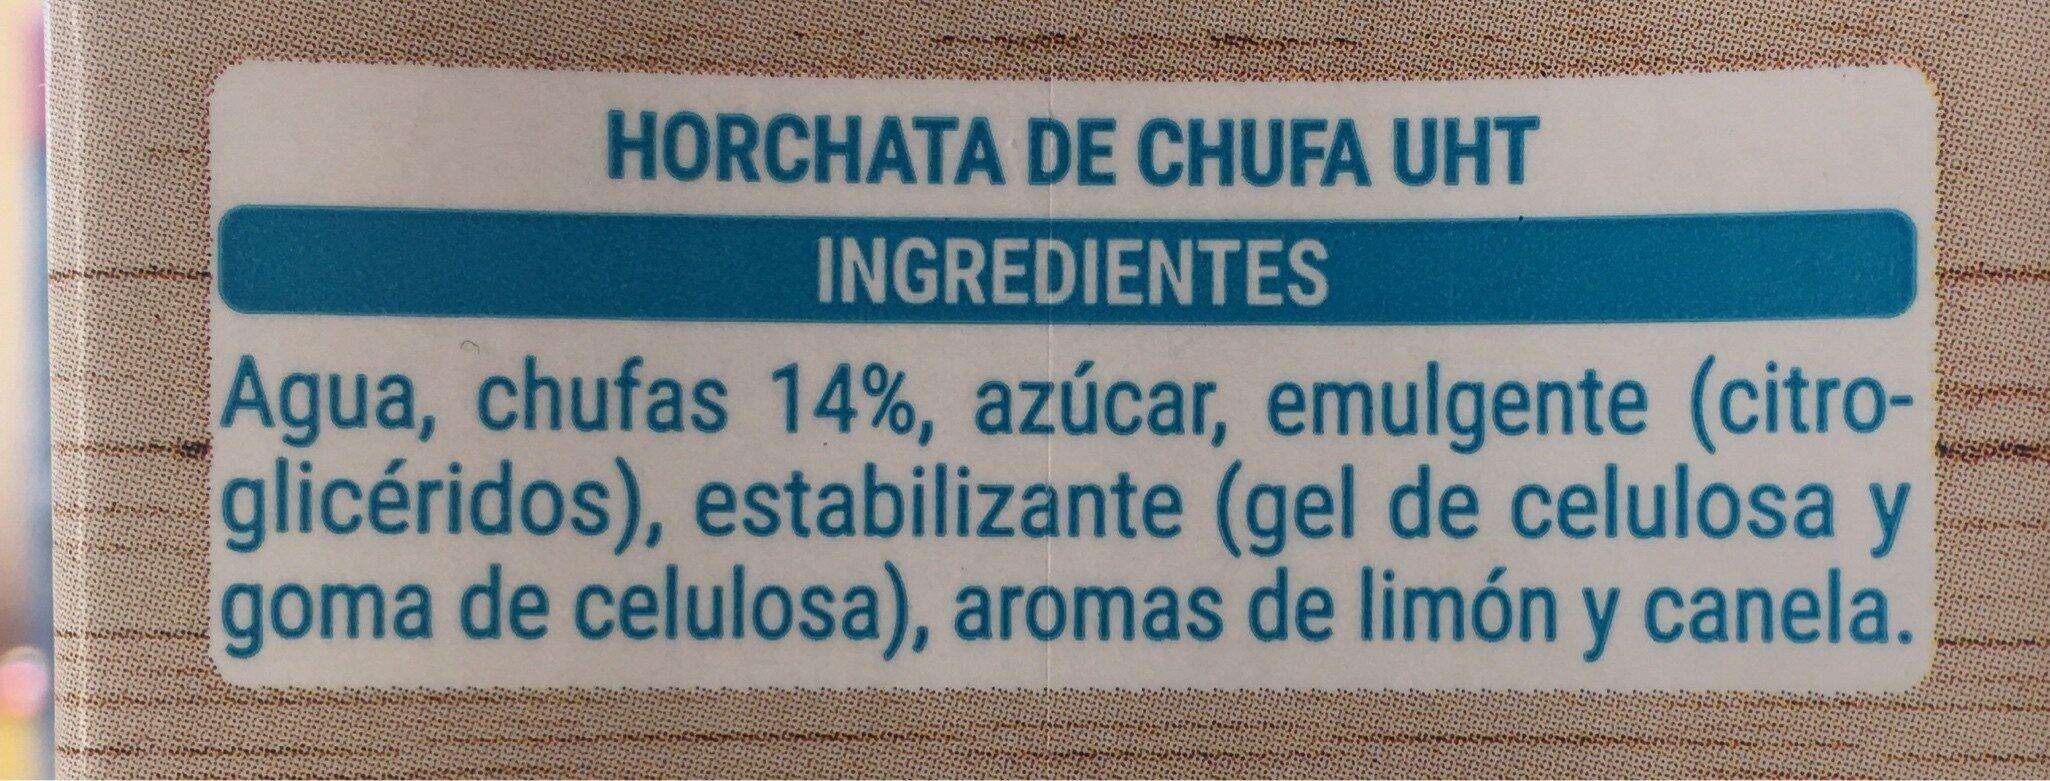 Horchata de chufa - Ingredientes - es